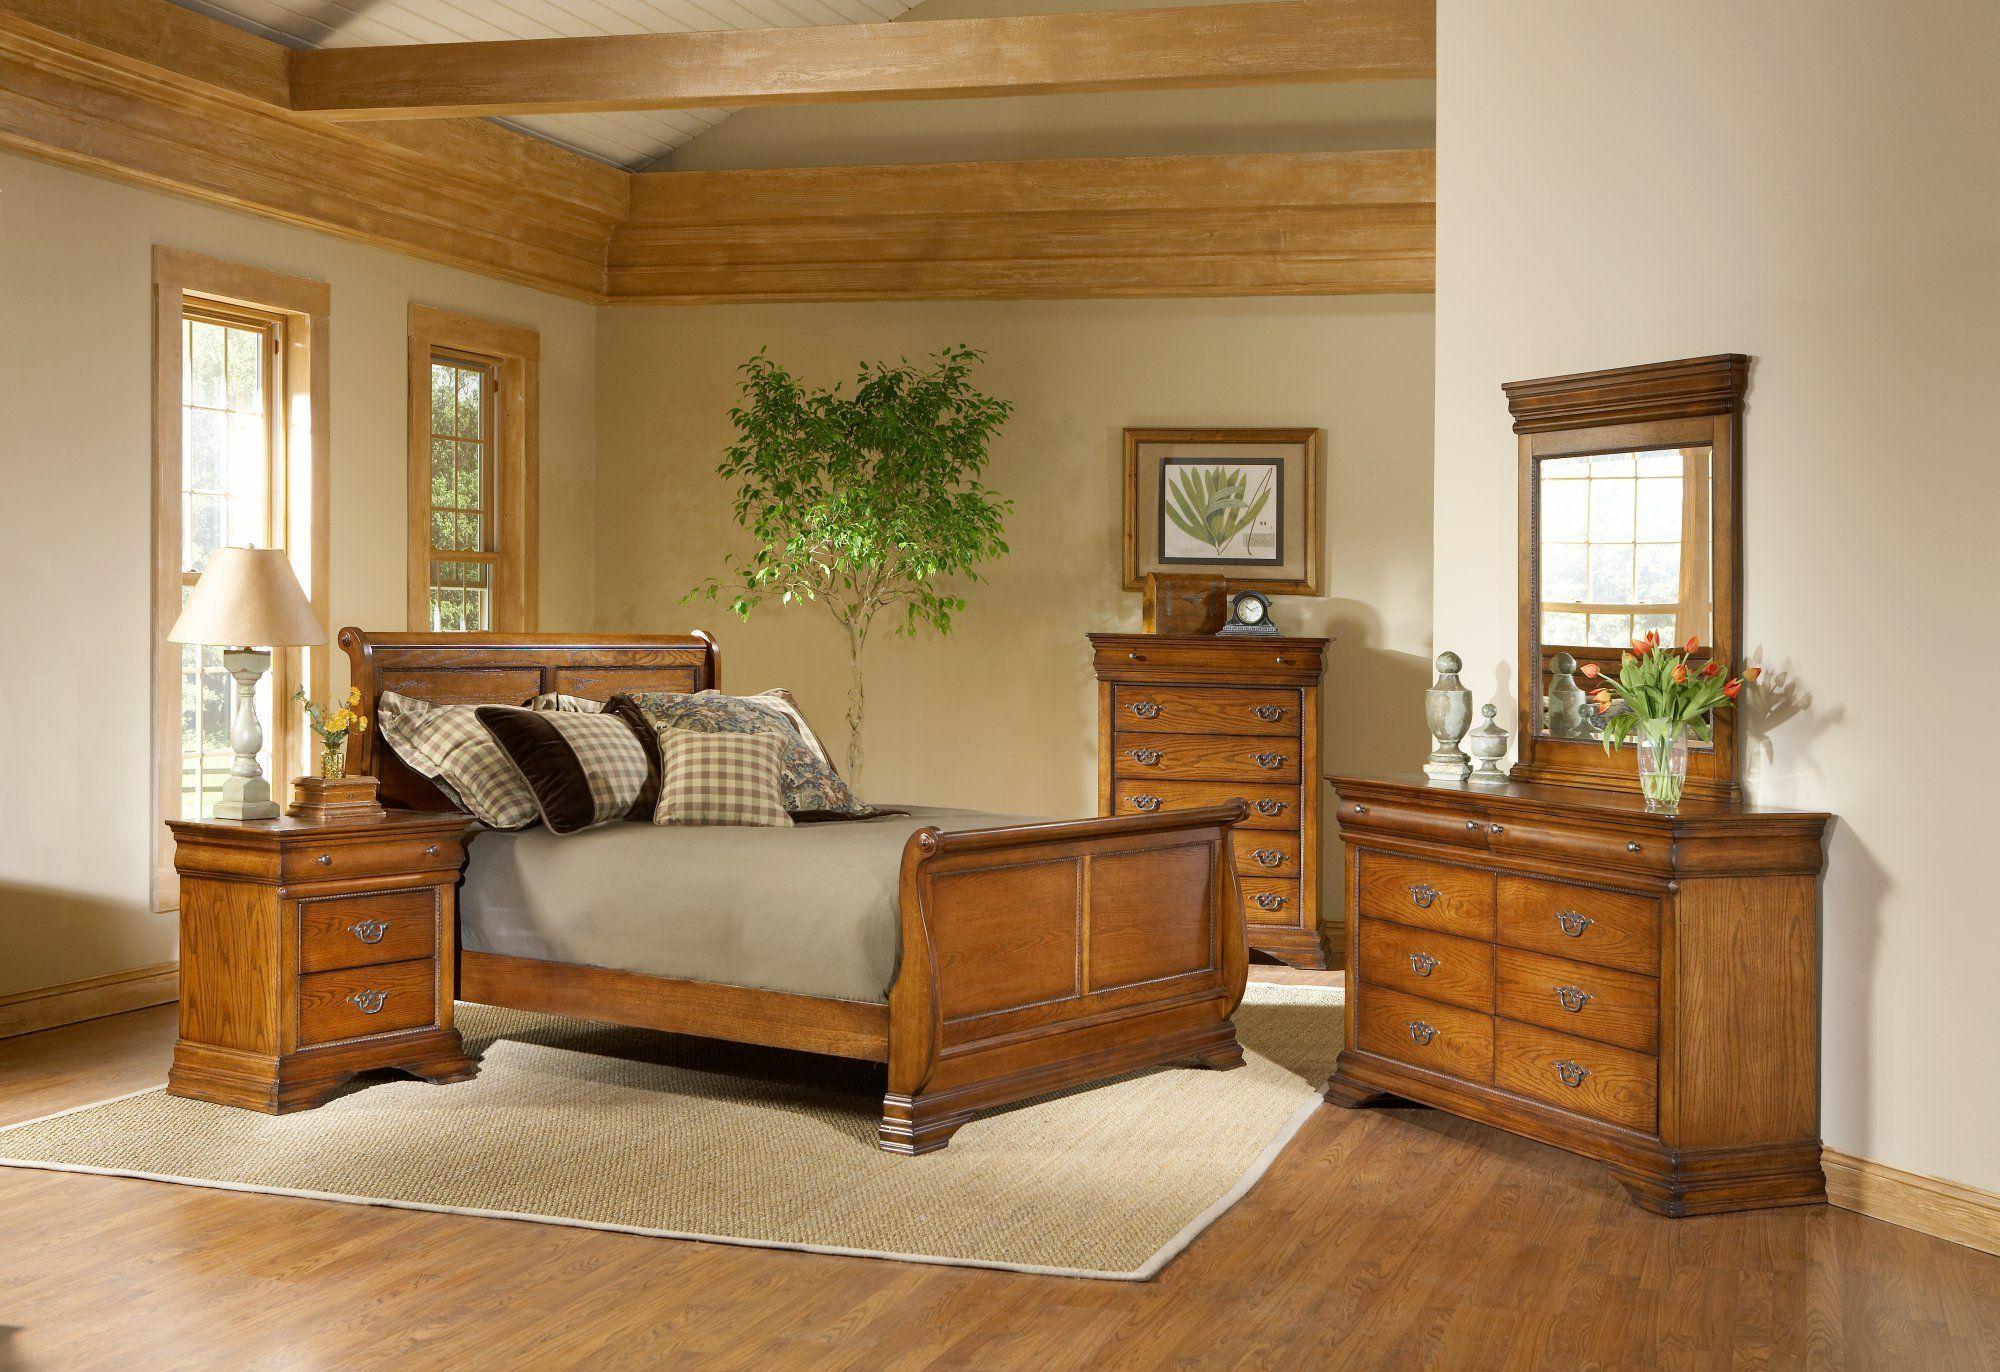 Replacement Hardware For Bedroom Furniture | Zef Jam